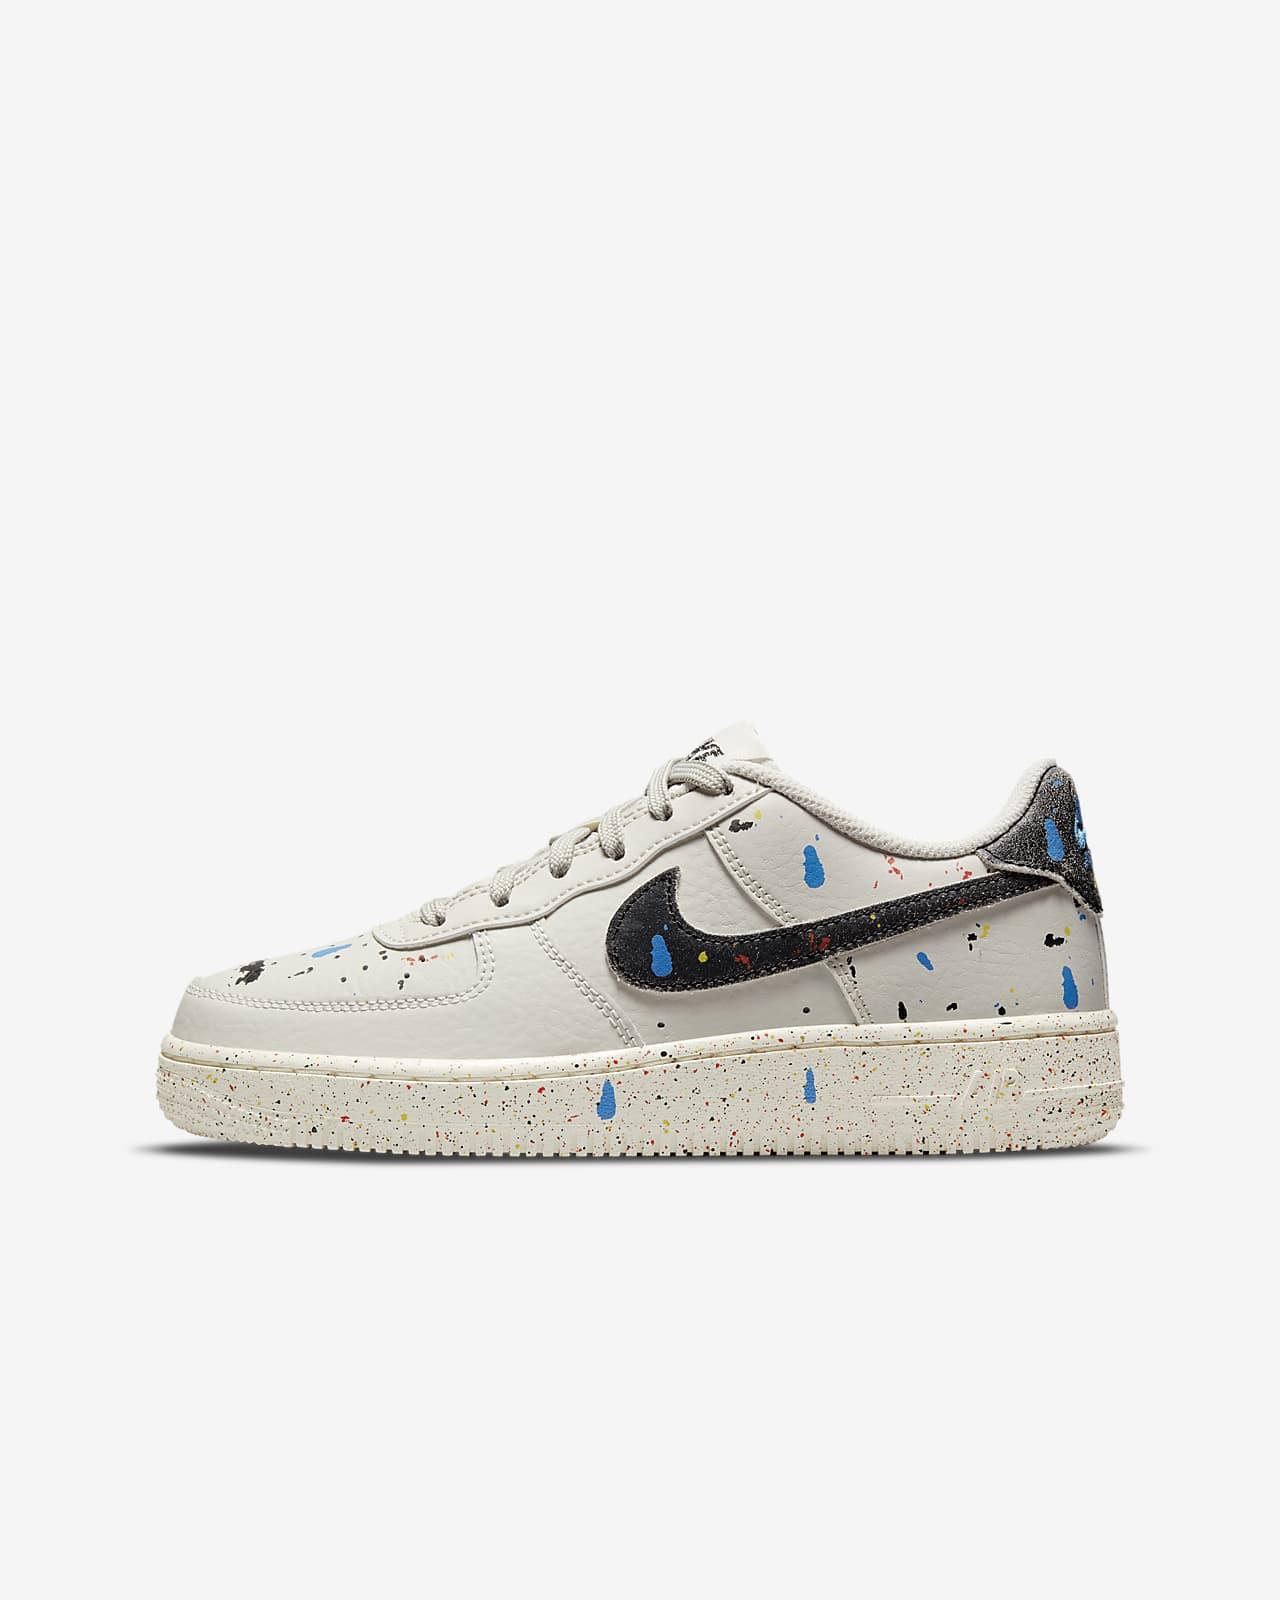 Nike Air Force 1 LV8 3 Older Kids' Shoe